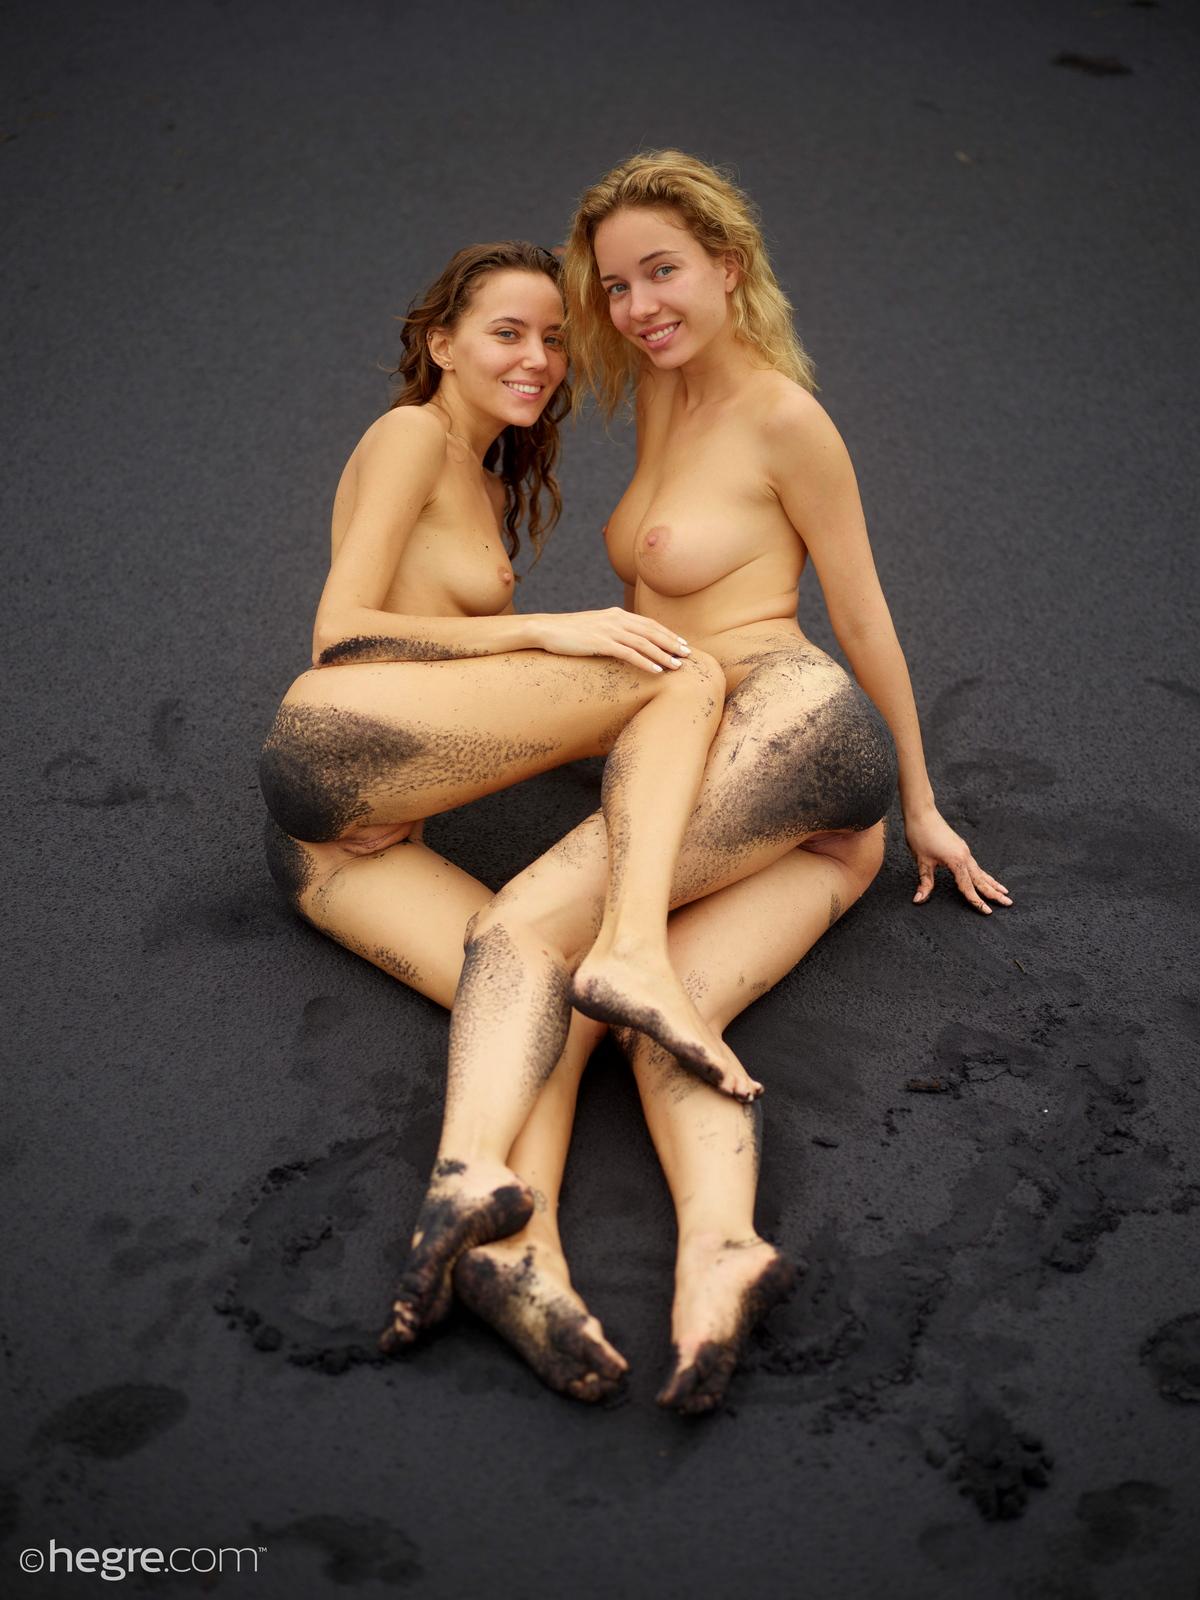 clover-natalia-a-nude-bali-beach-seaside-hegre-19